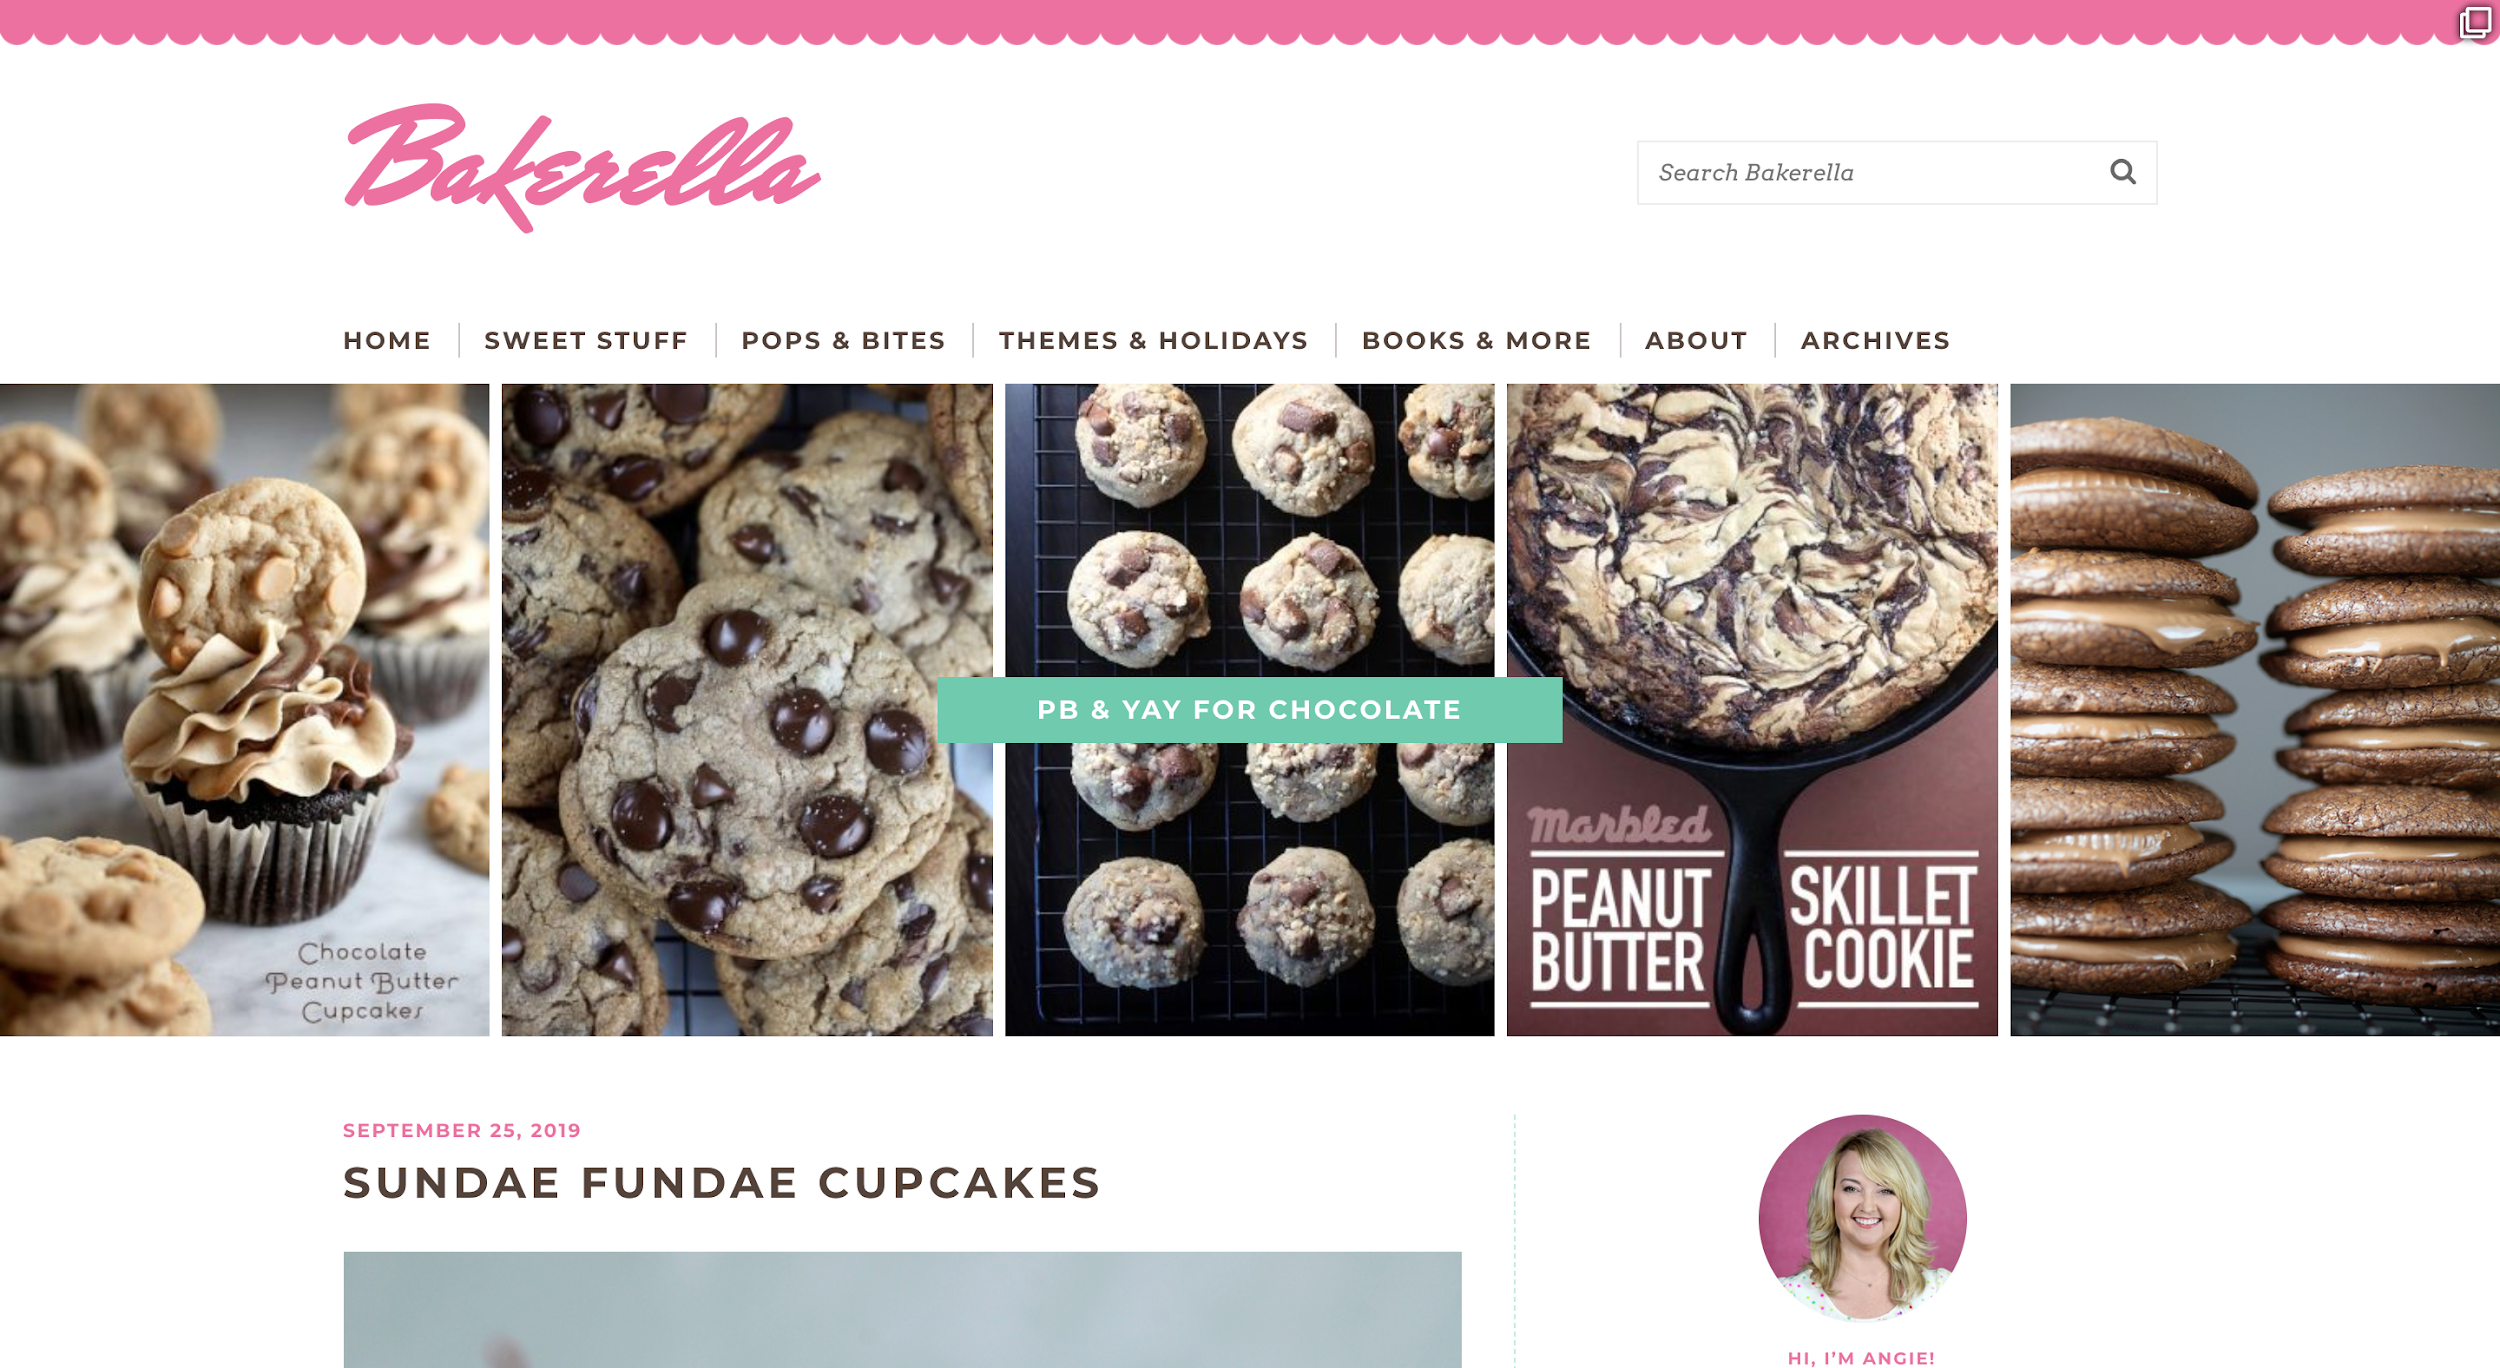 bakerella food blog name example